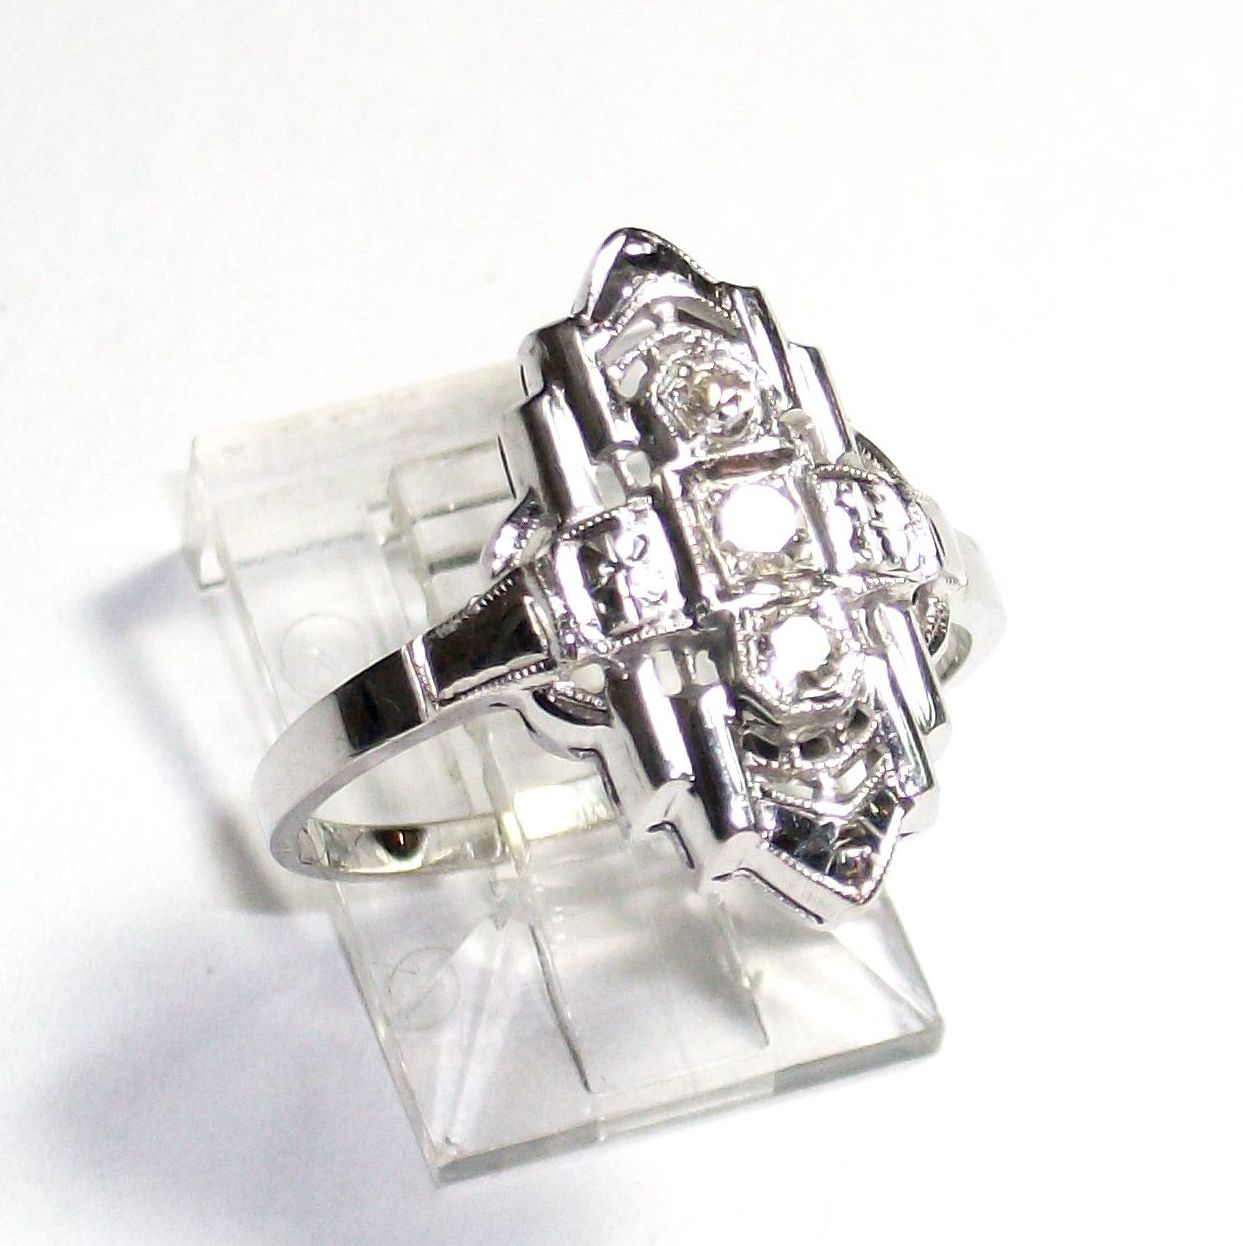 Sortija de oro de 14k con diamantes de Estilo Art Decó: Catálogo de Antigua Joyeros